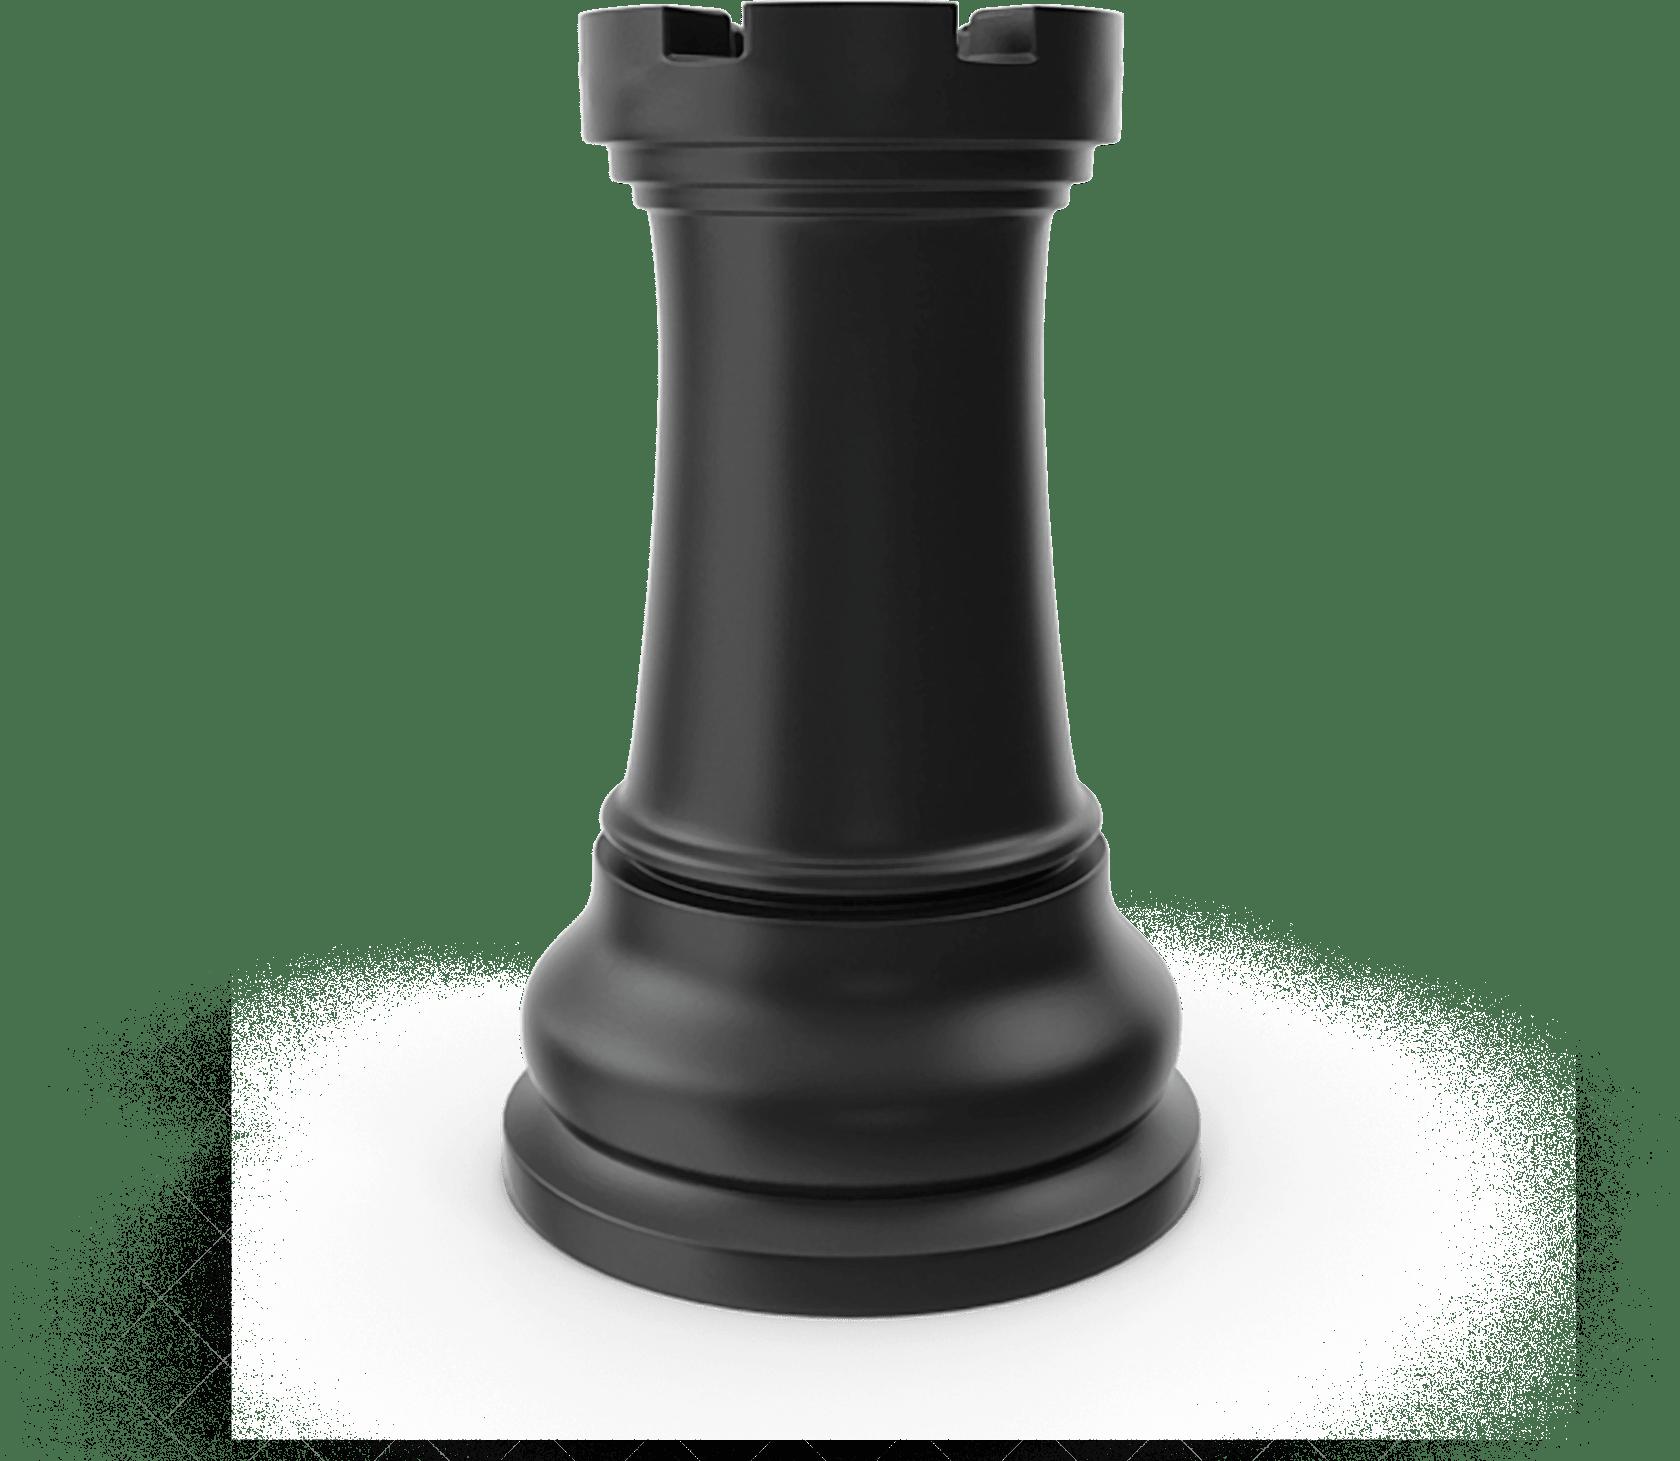 слоем картинки белая ладья шахматы фото помогут